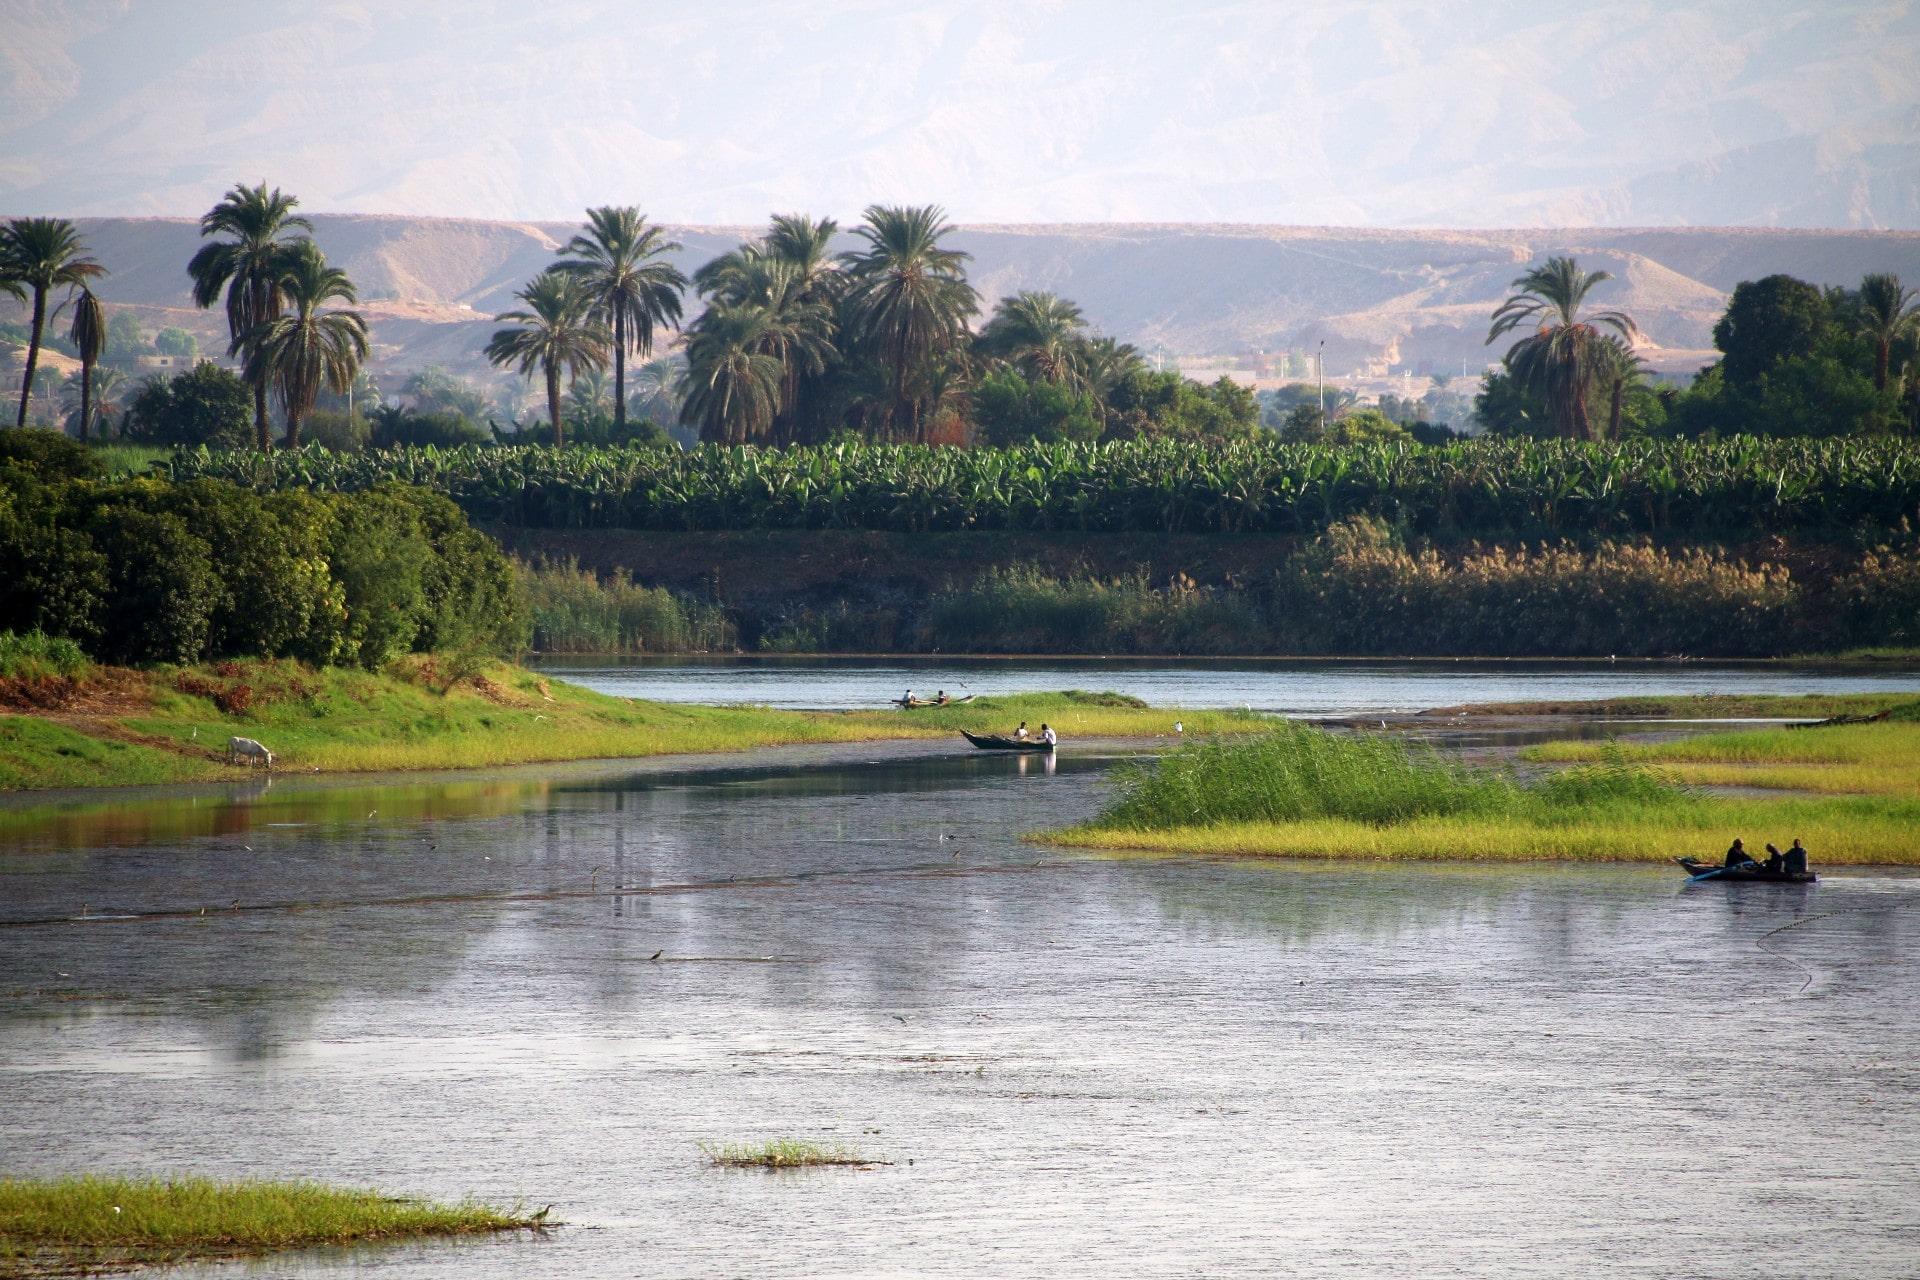 Circuit Egypte touristique I Dounia & la famille Octobre 2010